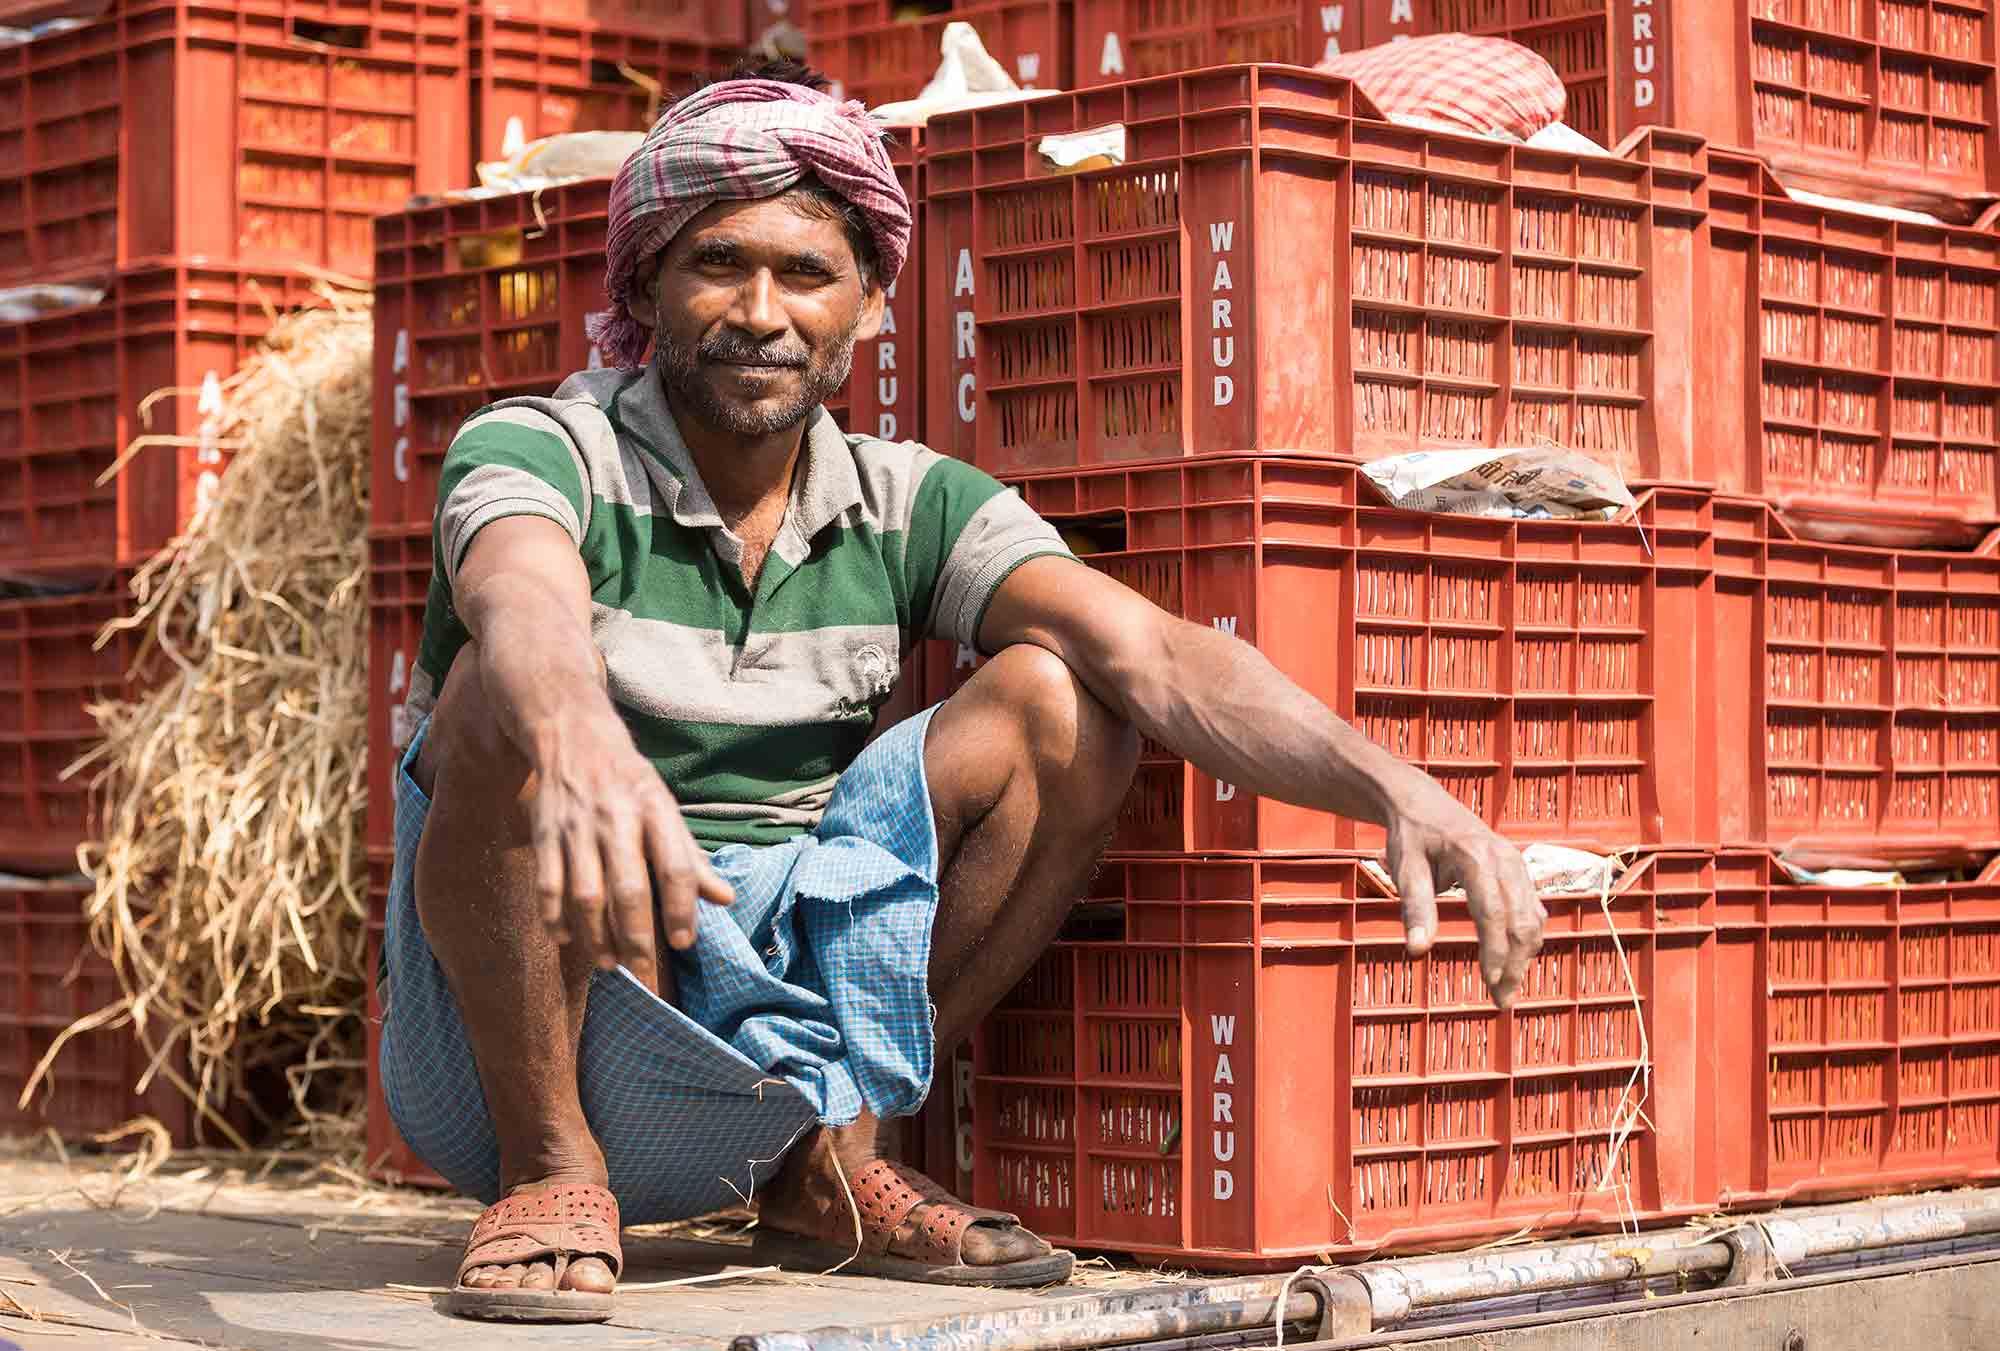 Mechhua-Fruit-Market-man-kolkata-india